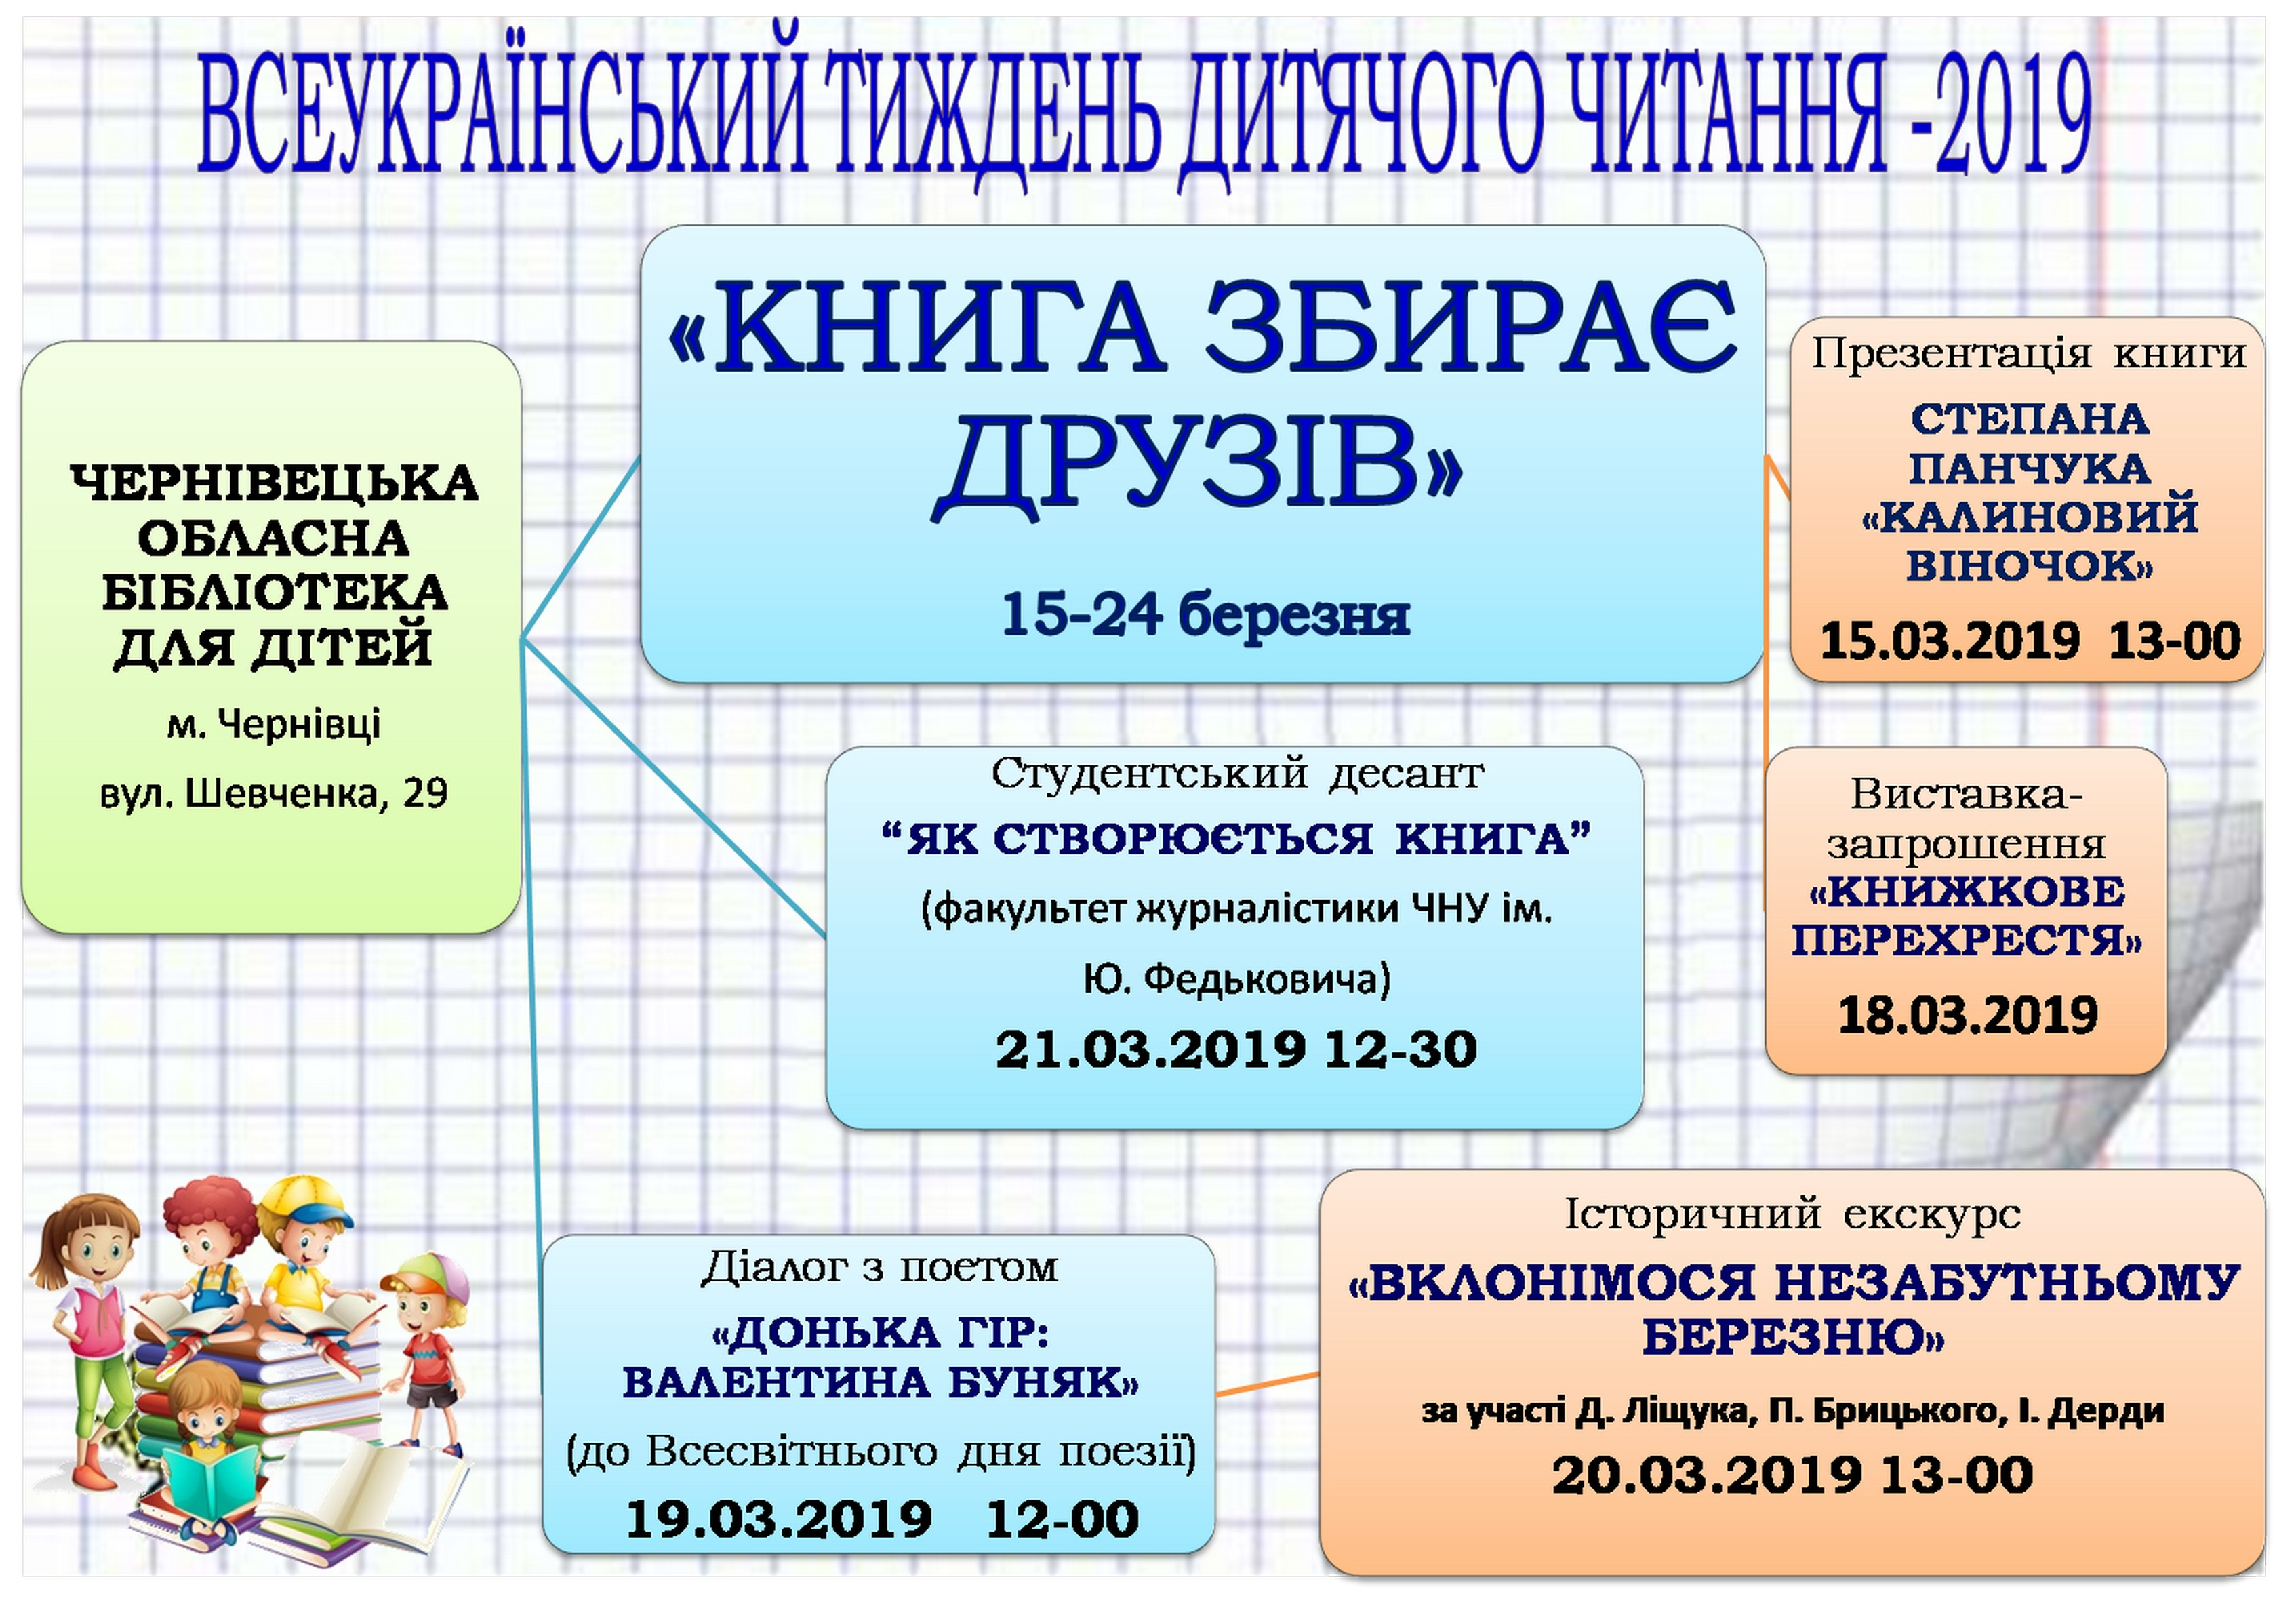 2019-03-13_150558